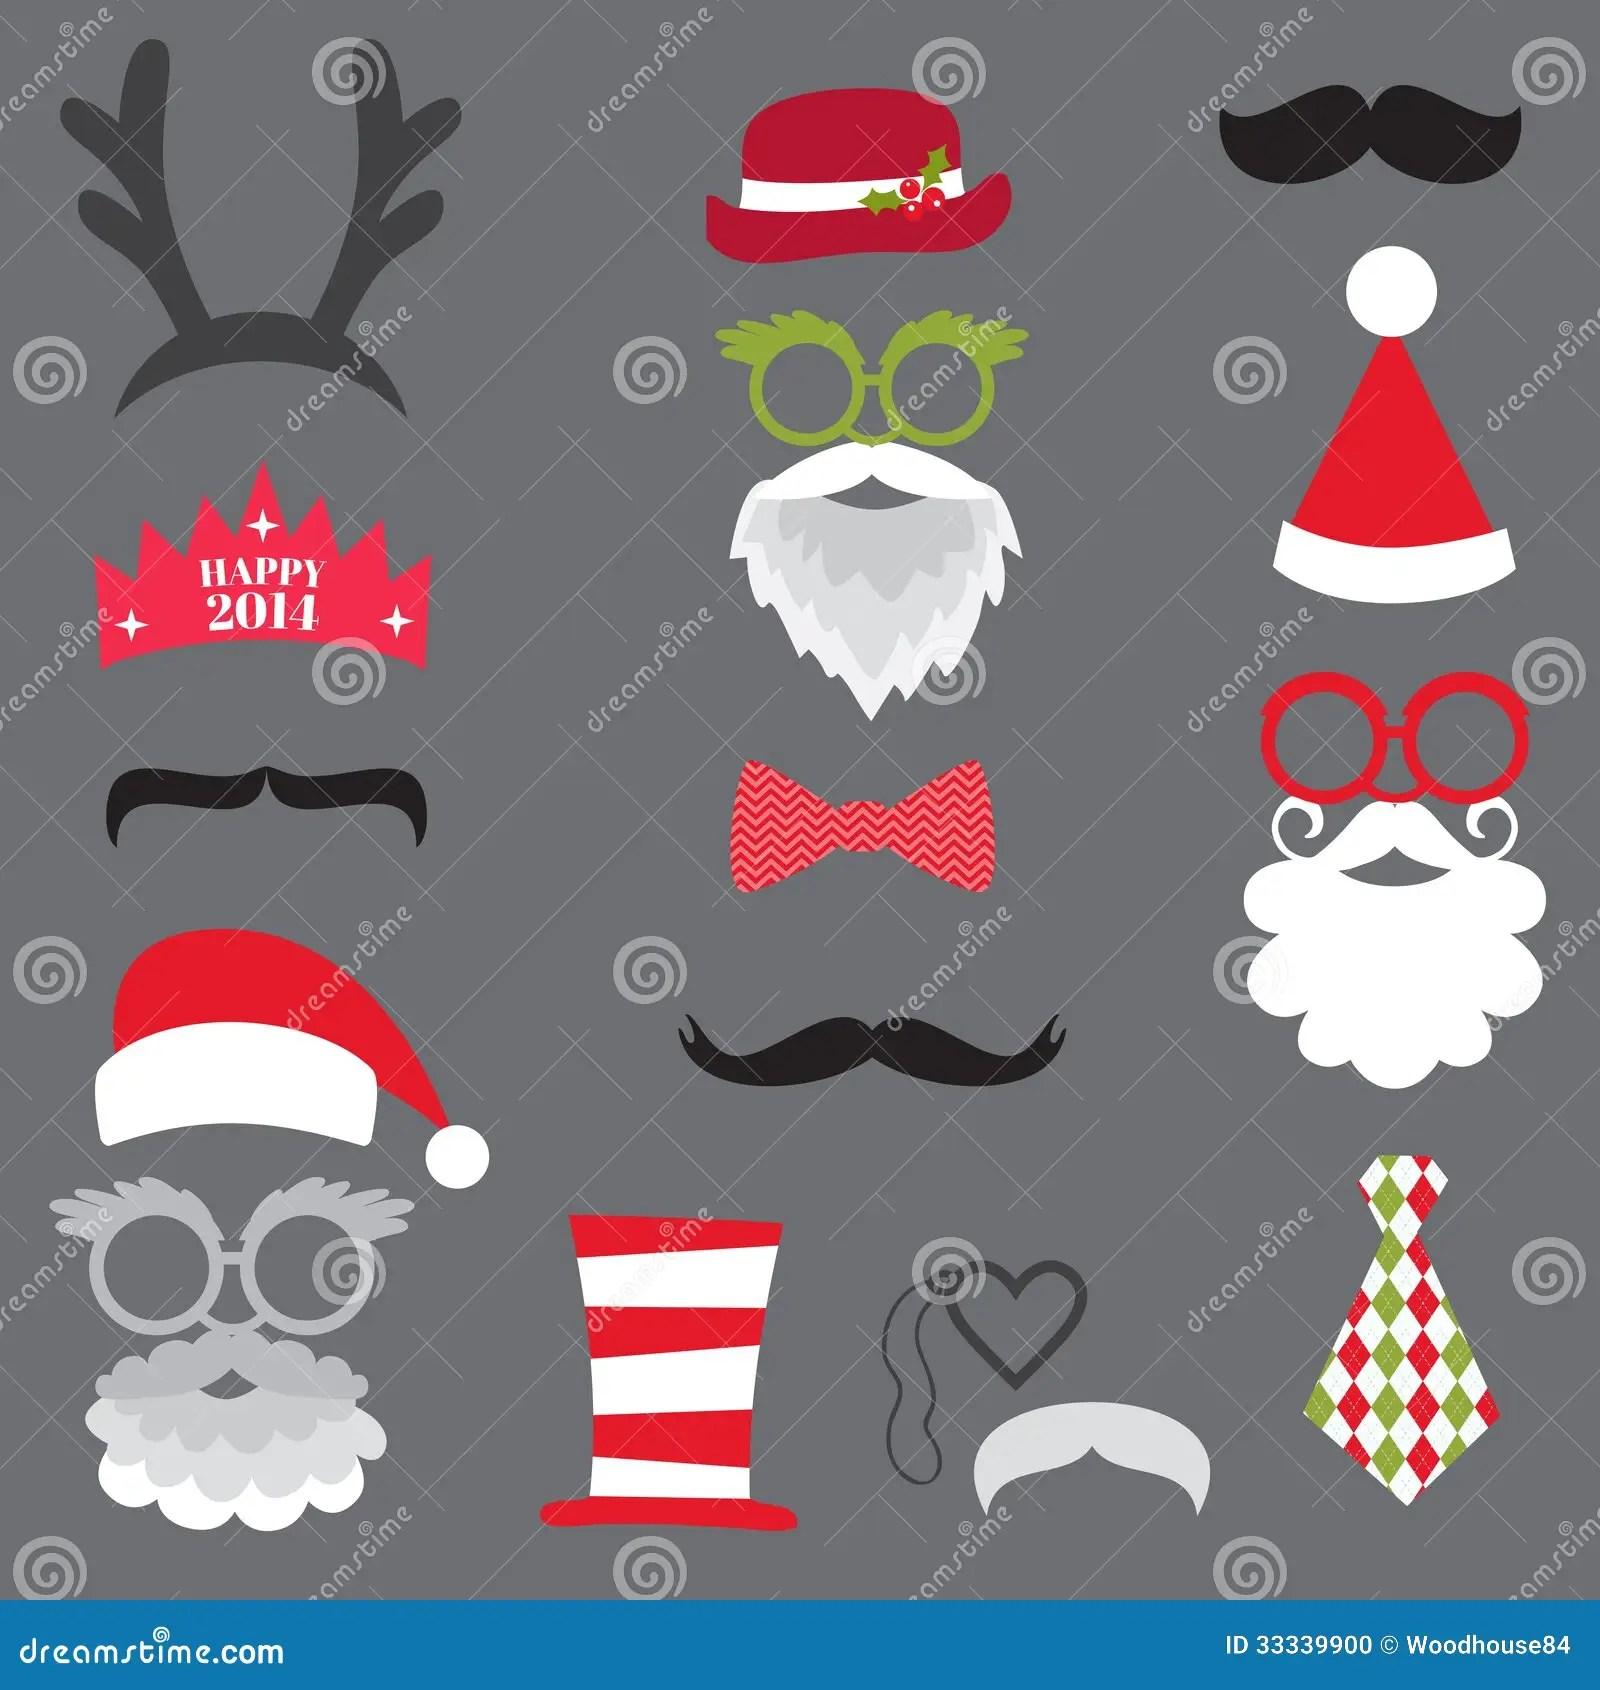 Christmas Retro Party Set Glasses Hats Lips M Stock